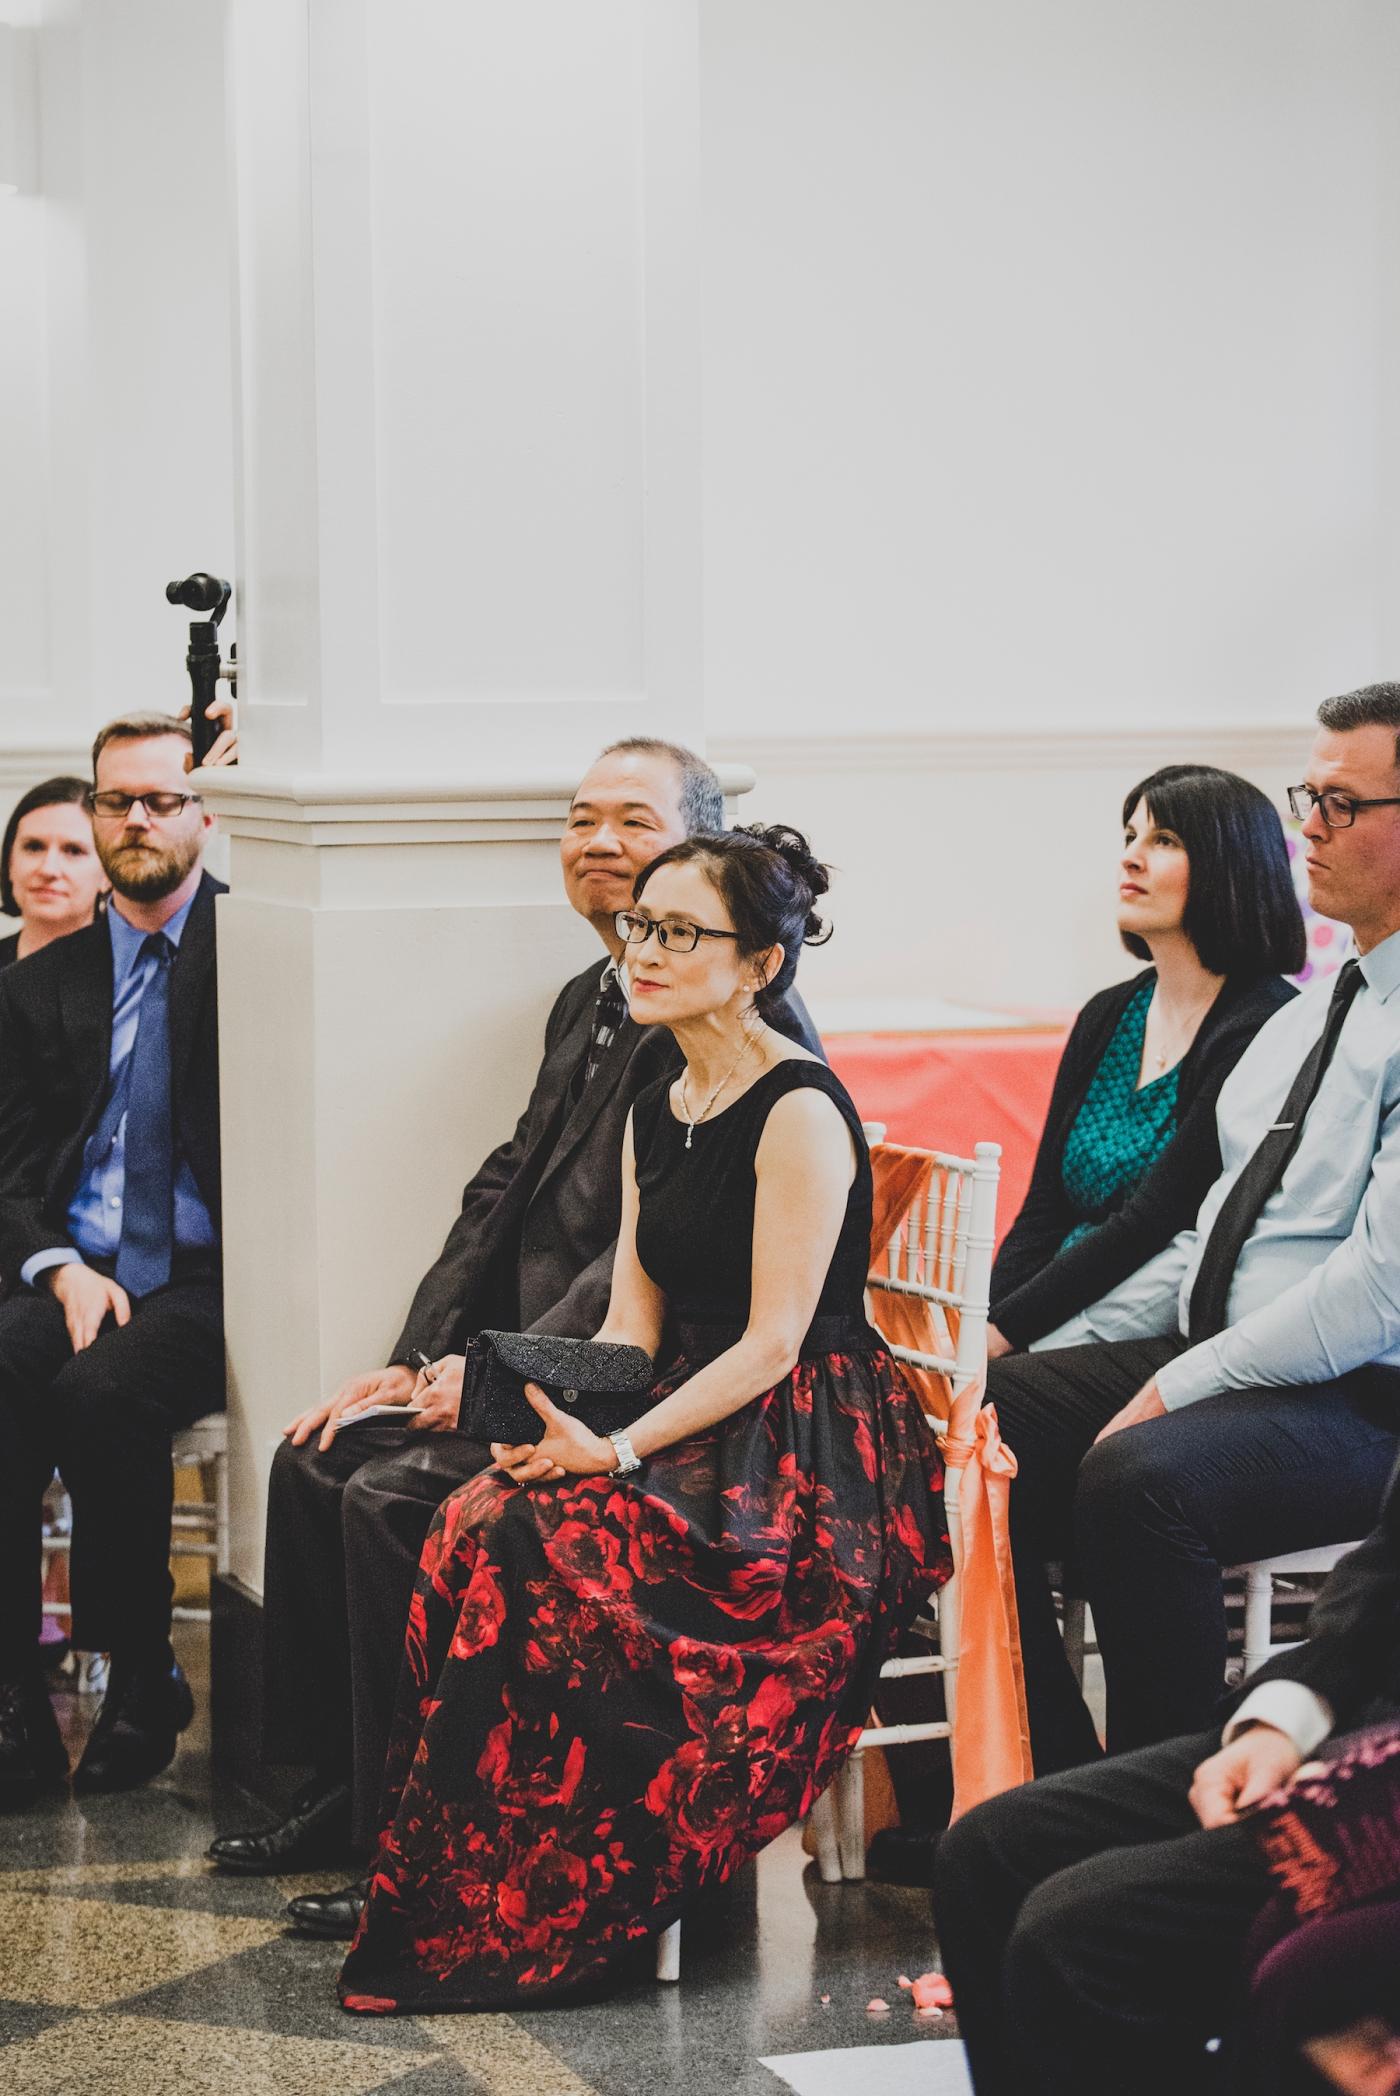 DSC_2613Everett_Wedding_Ballroom_Jane_Speleers_photography_Rachel_and_Edmund_Ceremony_2017